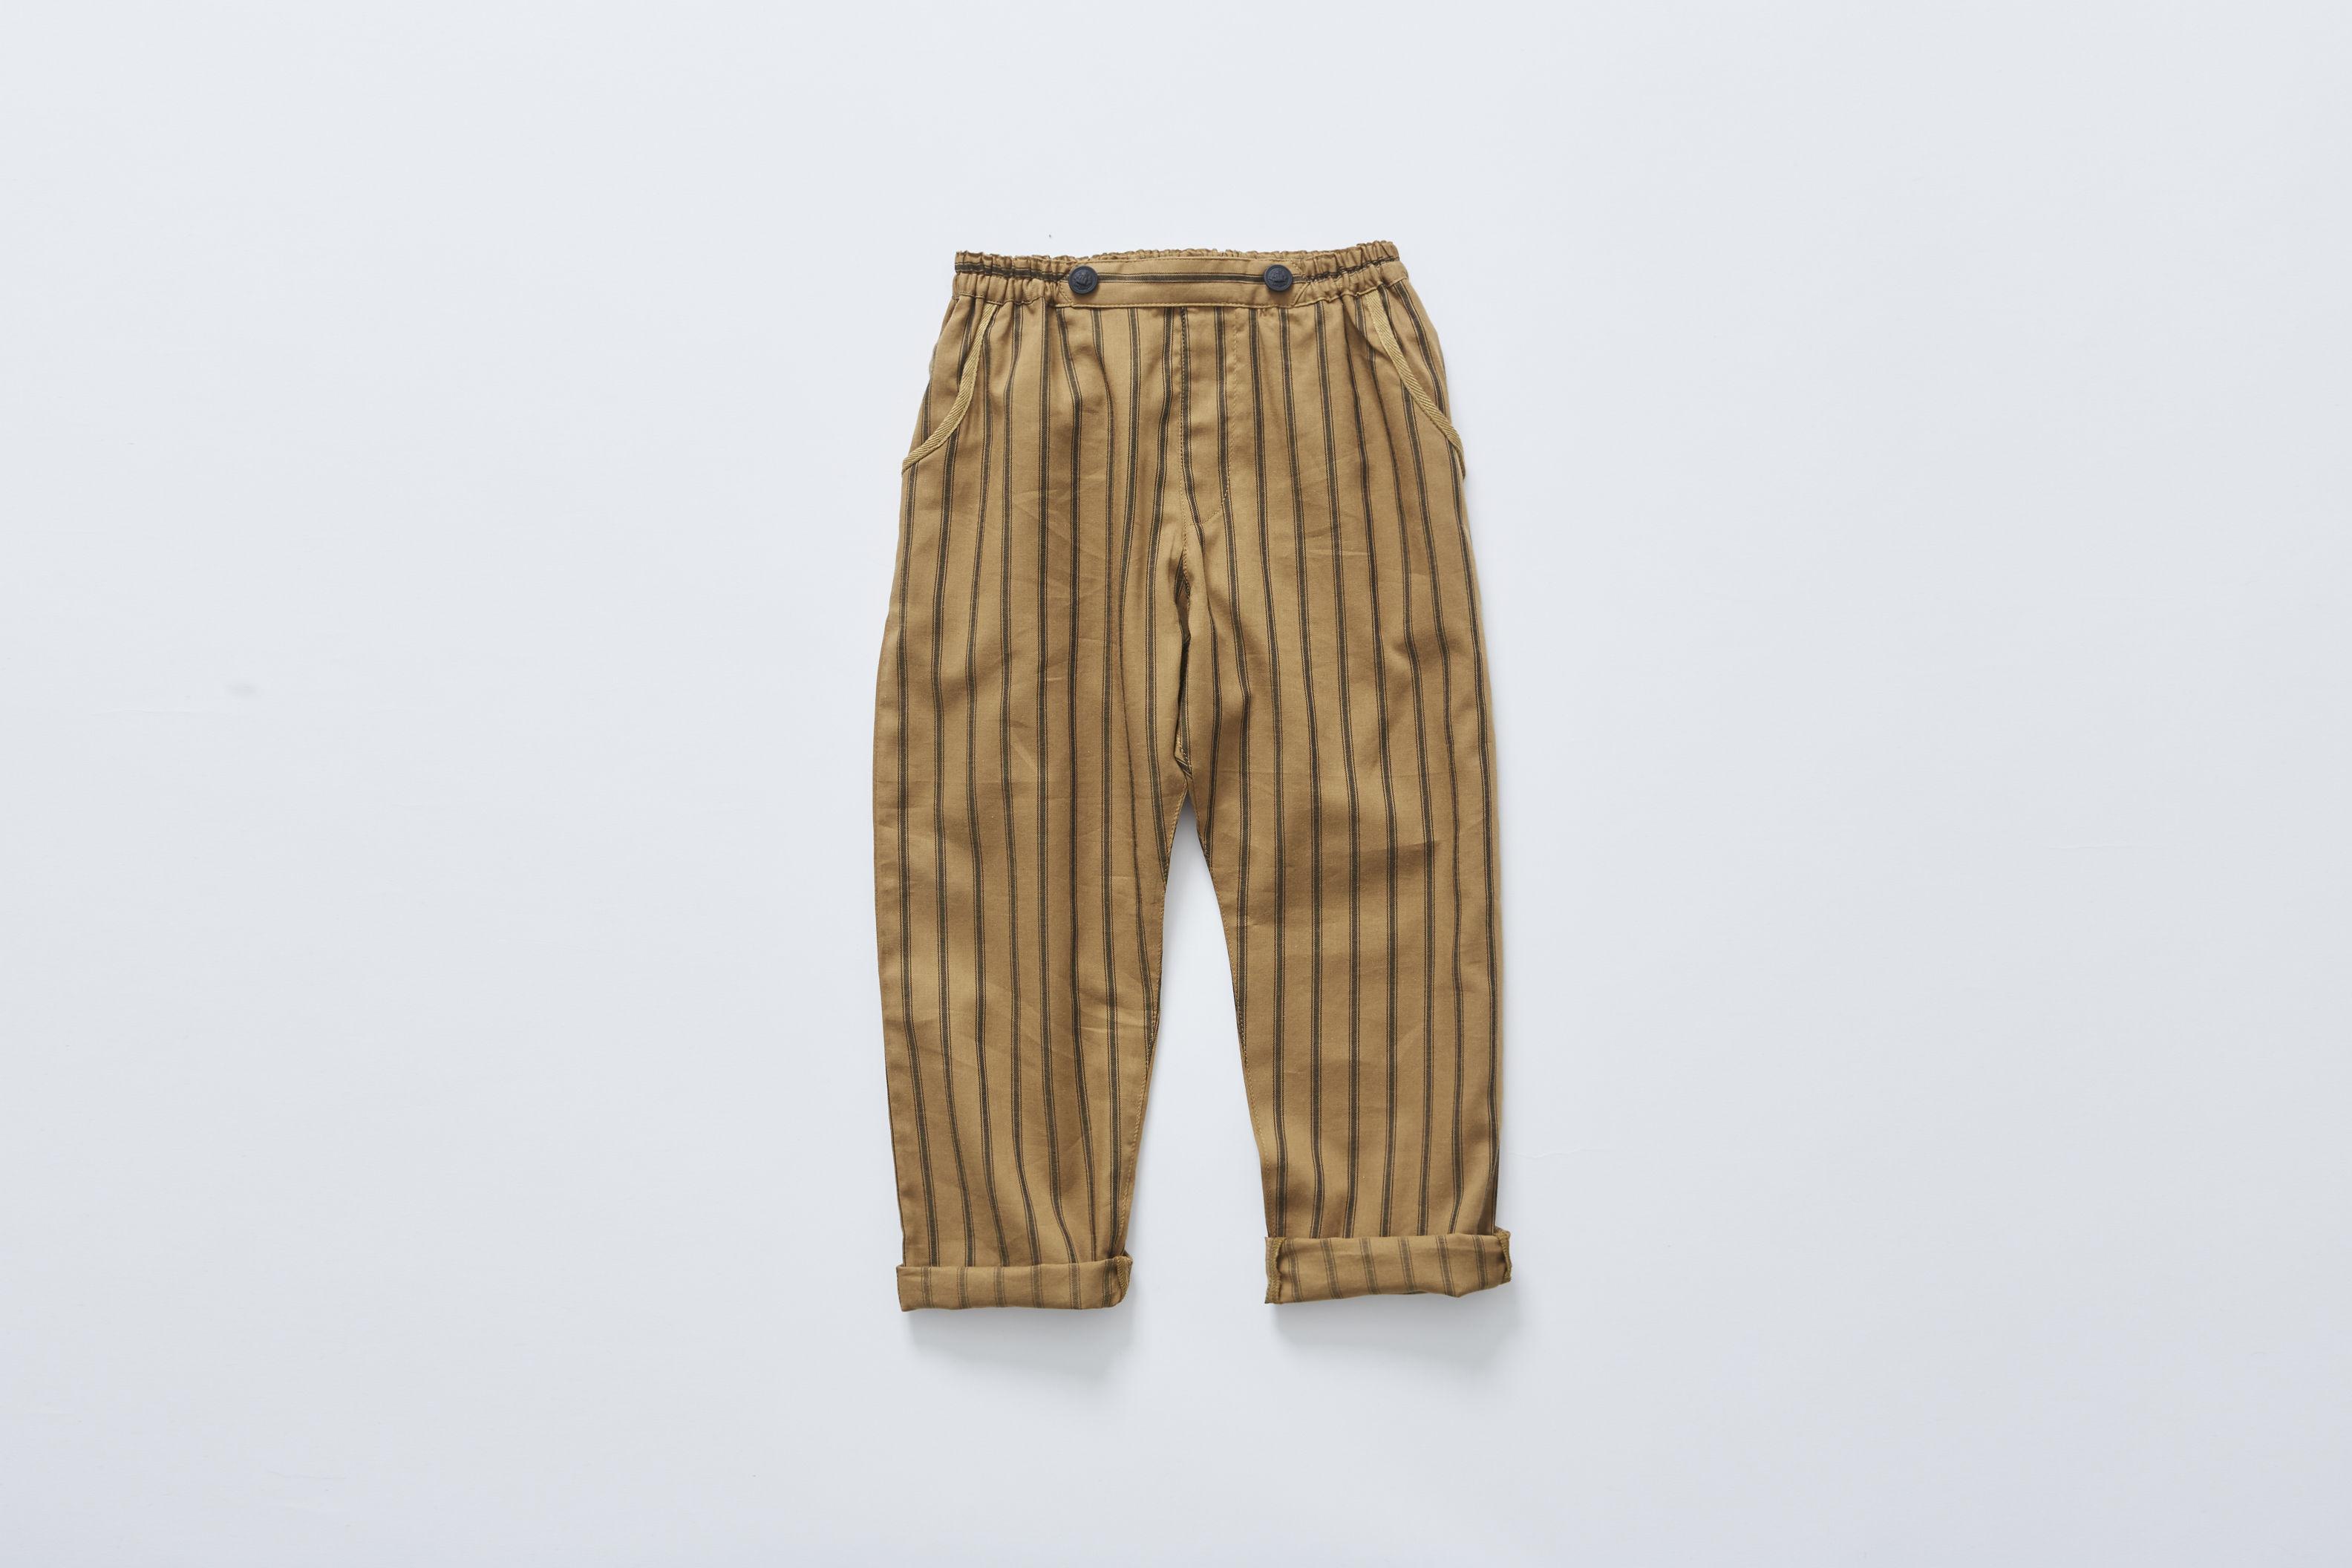 【cokitica 2017AW】cka-172F03 stripe pants / camel / 110-130cm